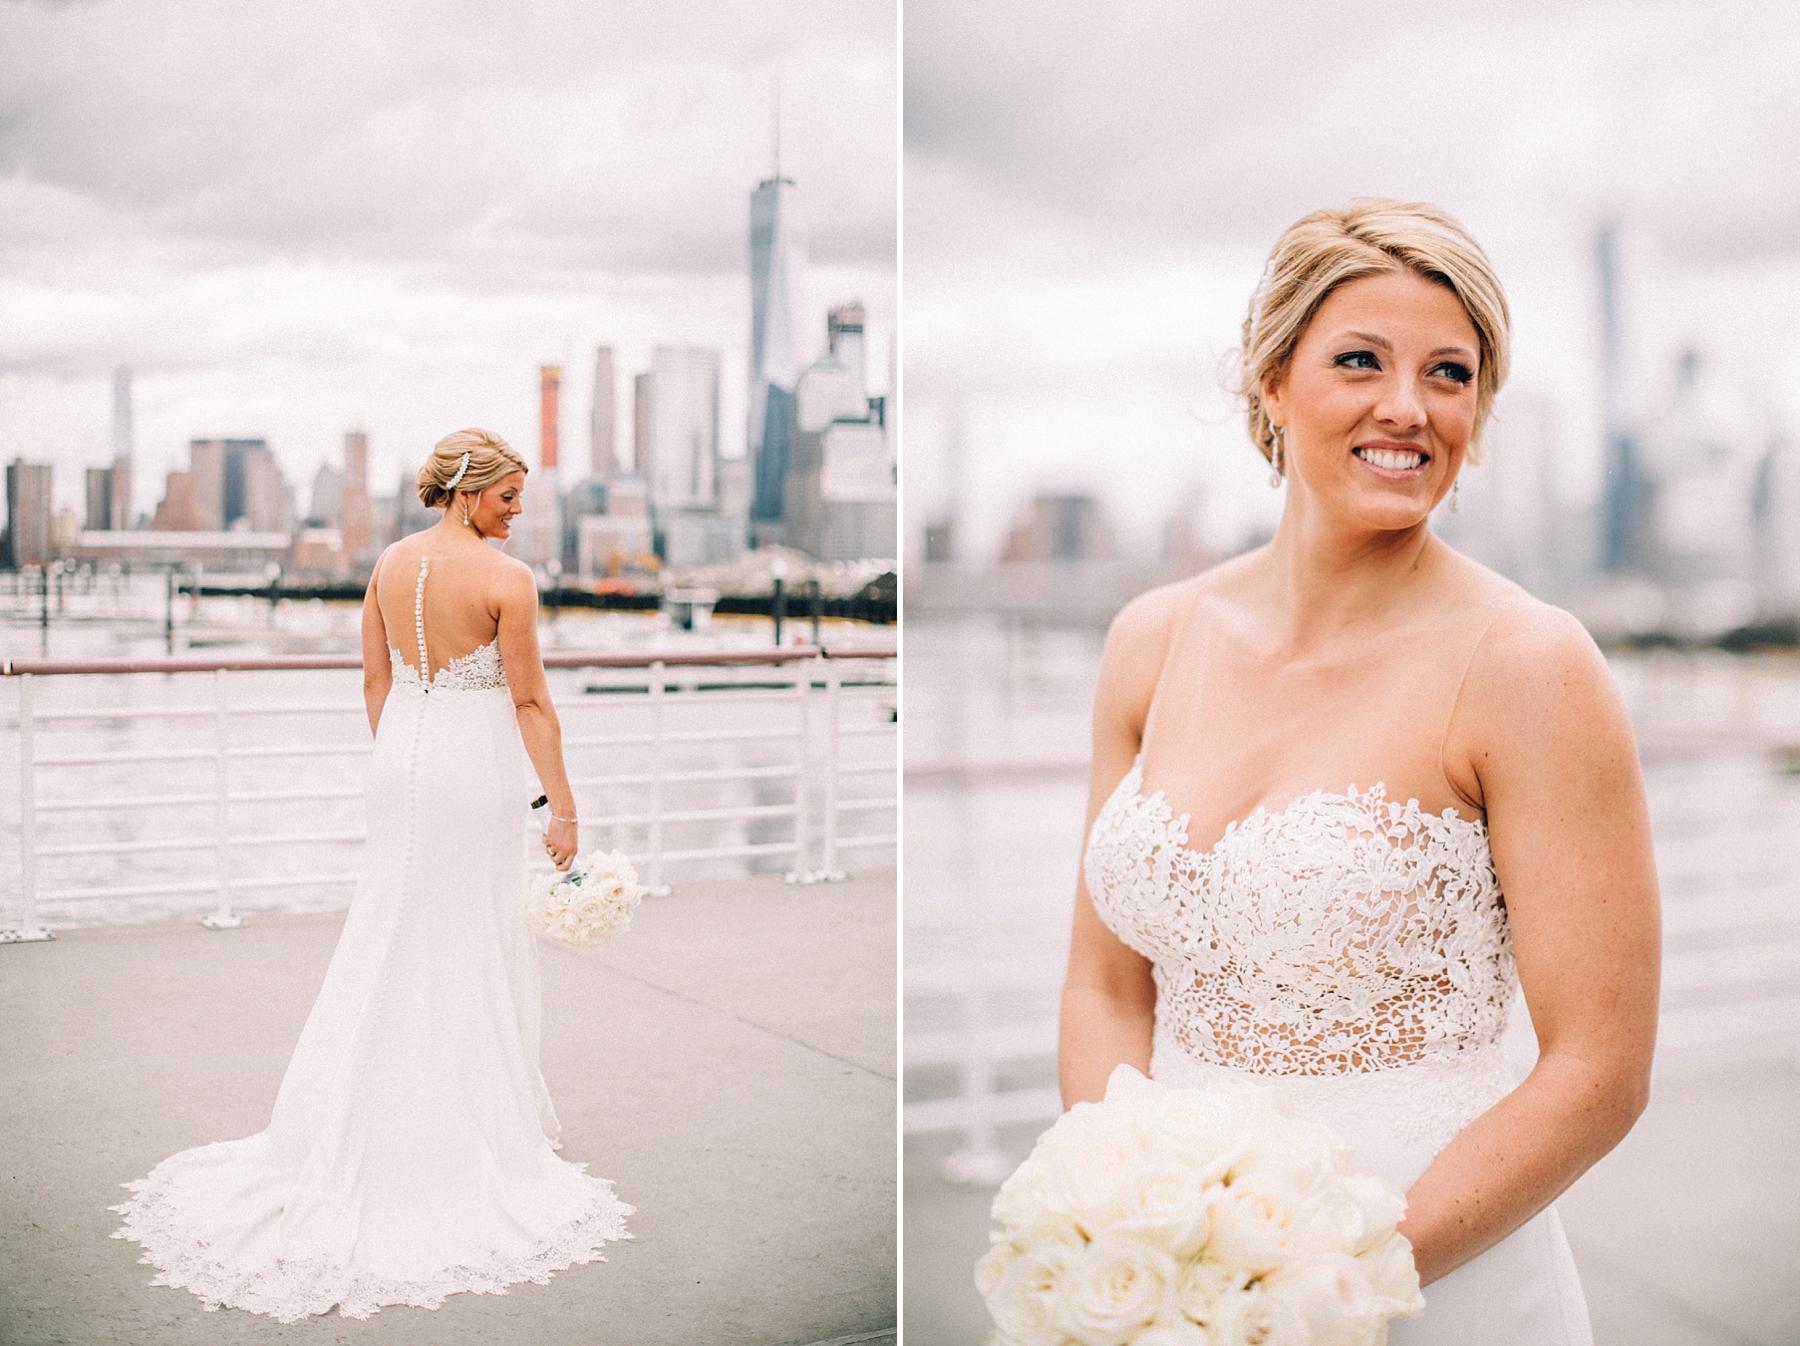 jersey-city-nj-wedding-photographer-top_0019.jpg